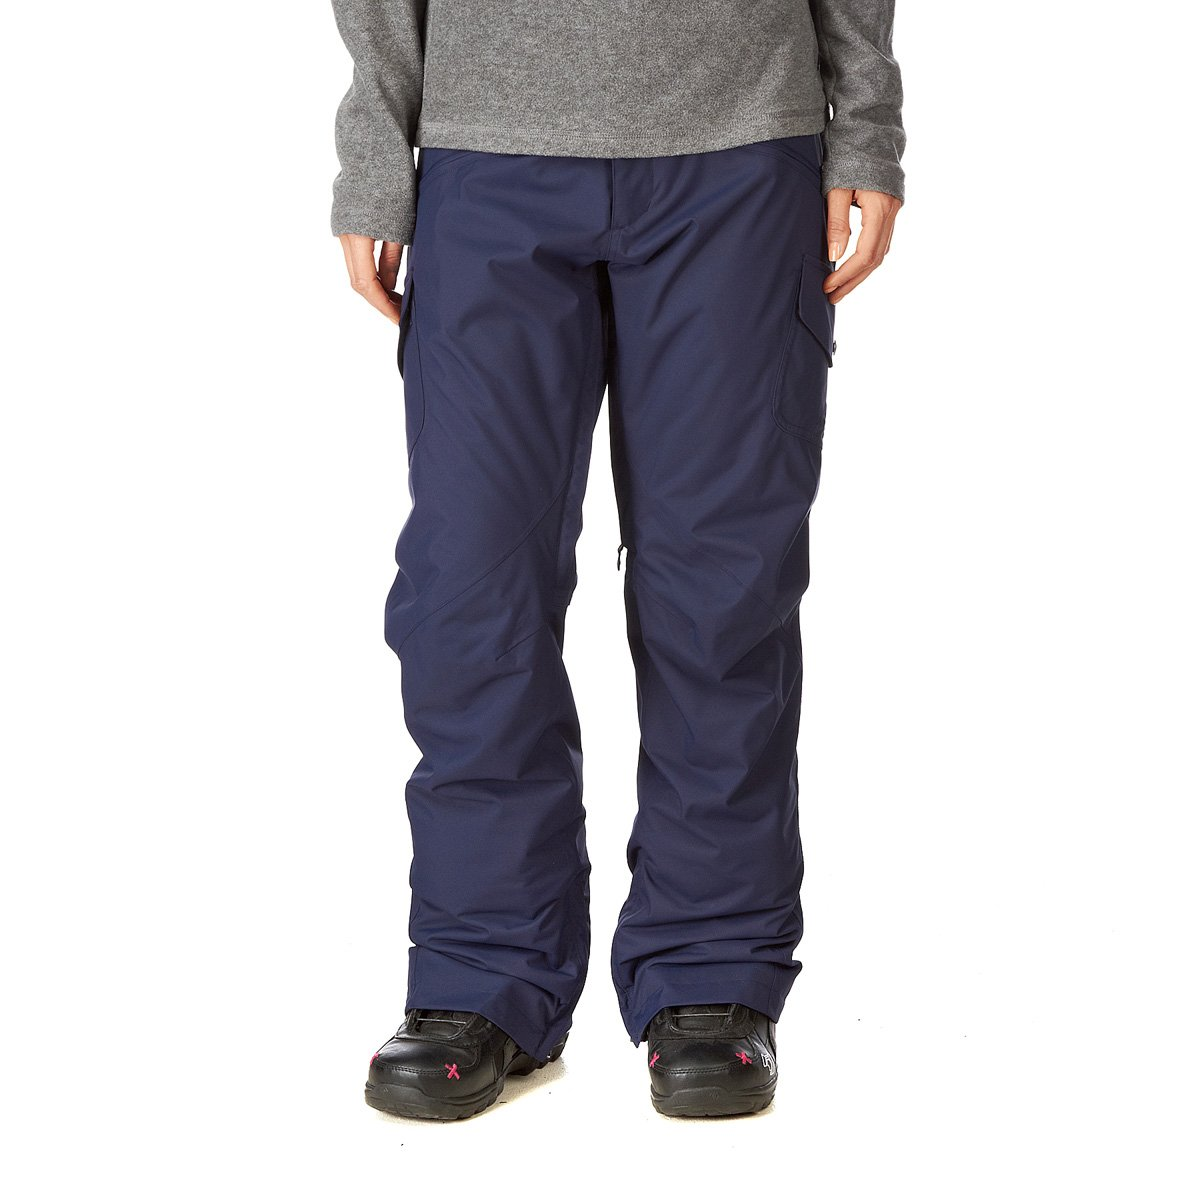 Burton Damen Snowboardhose WB Fly Pants günstig kaufen